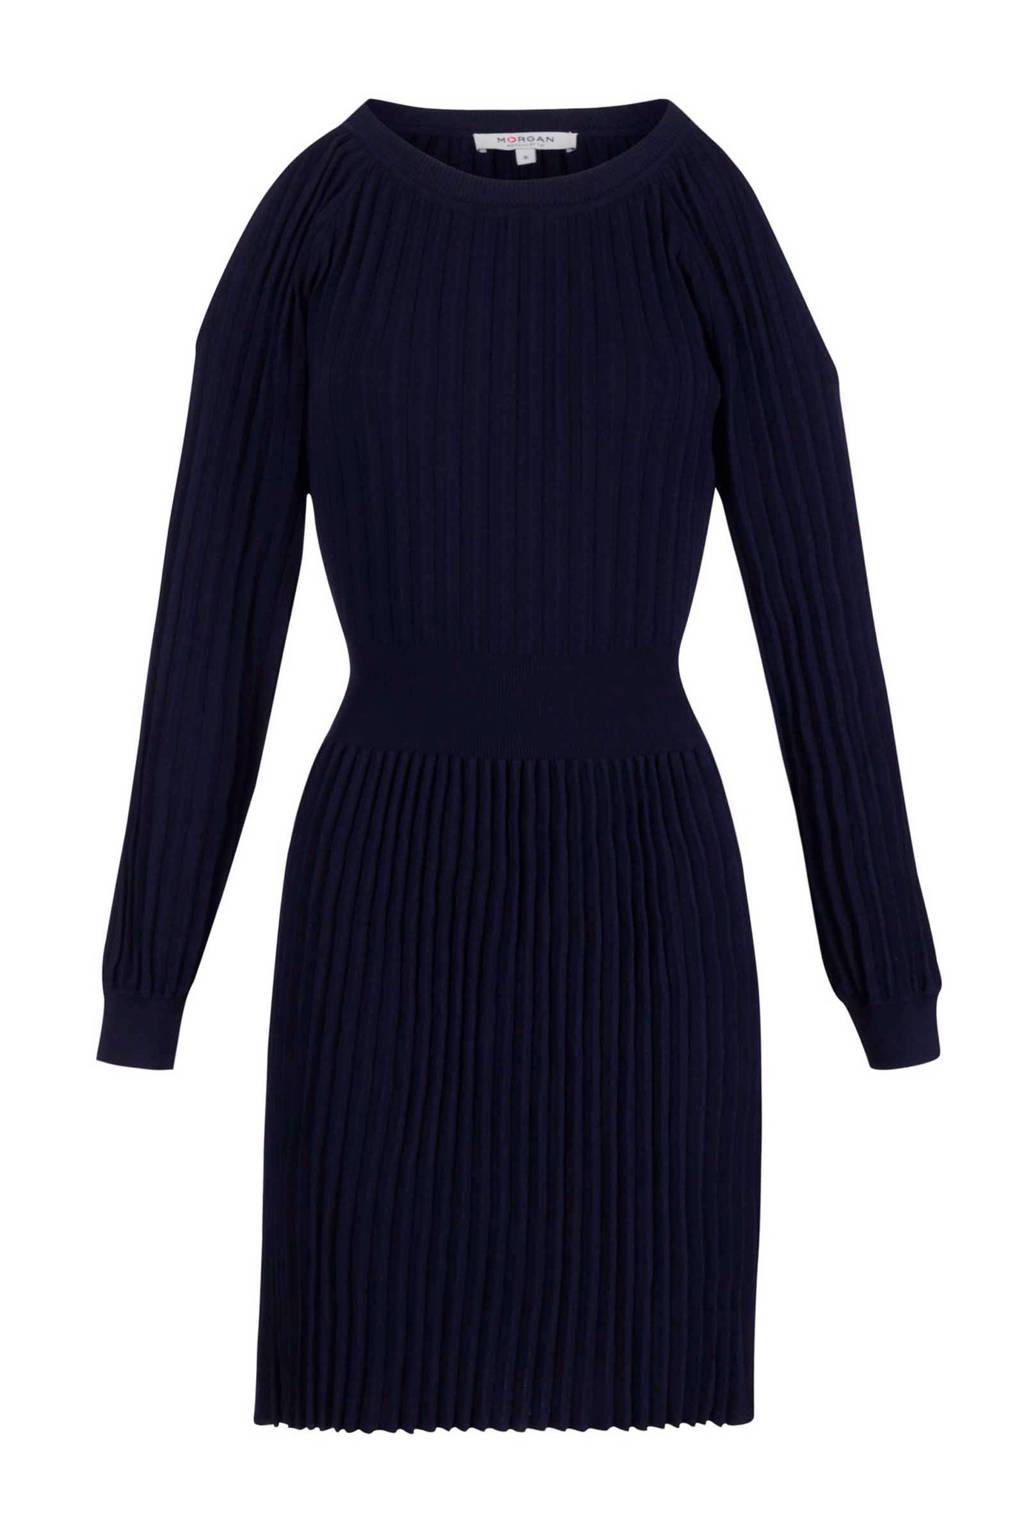 Morgan open shoulder plissé jurk marineblauw, Marineblauw